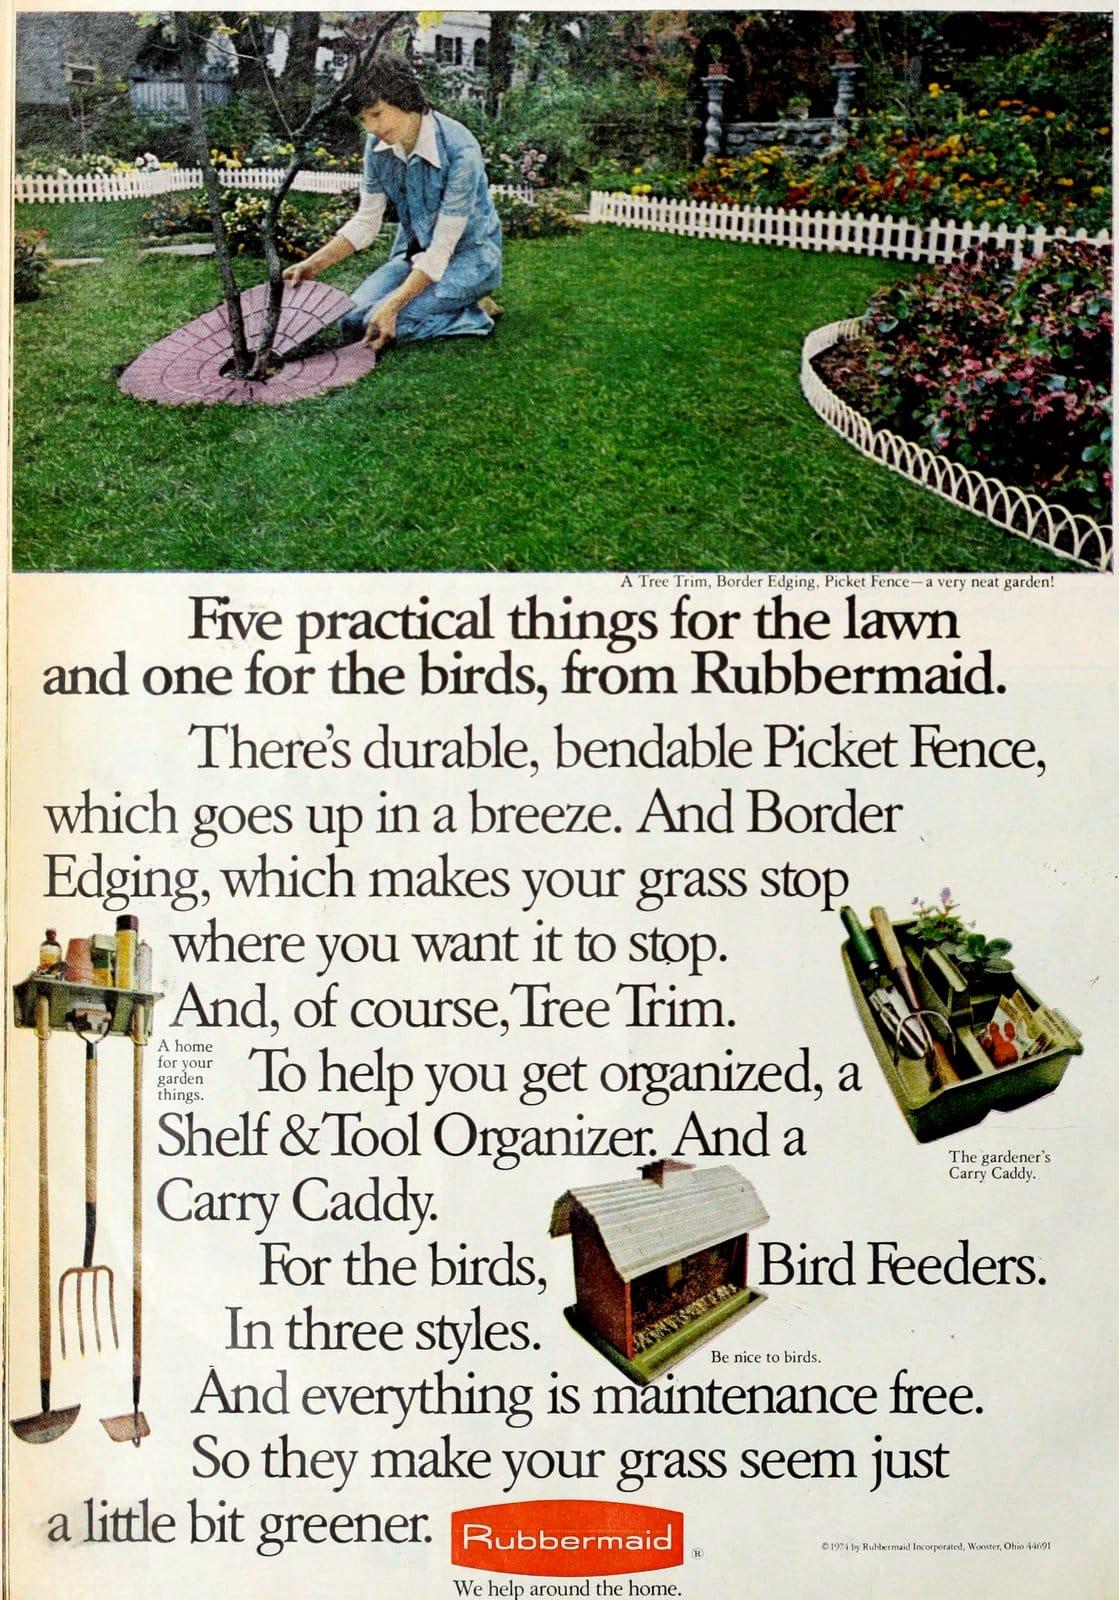 Vintage Rubbermaid plastic border fence for garden (1974)